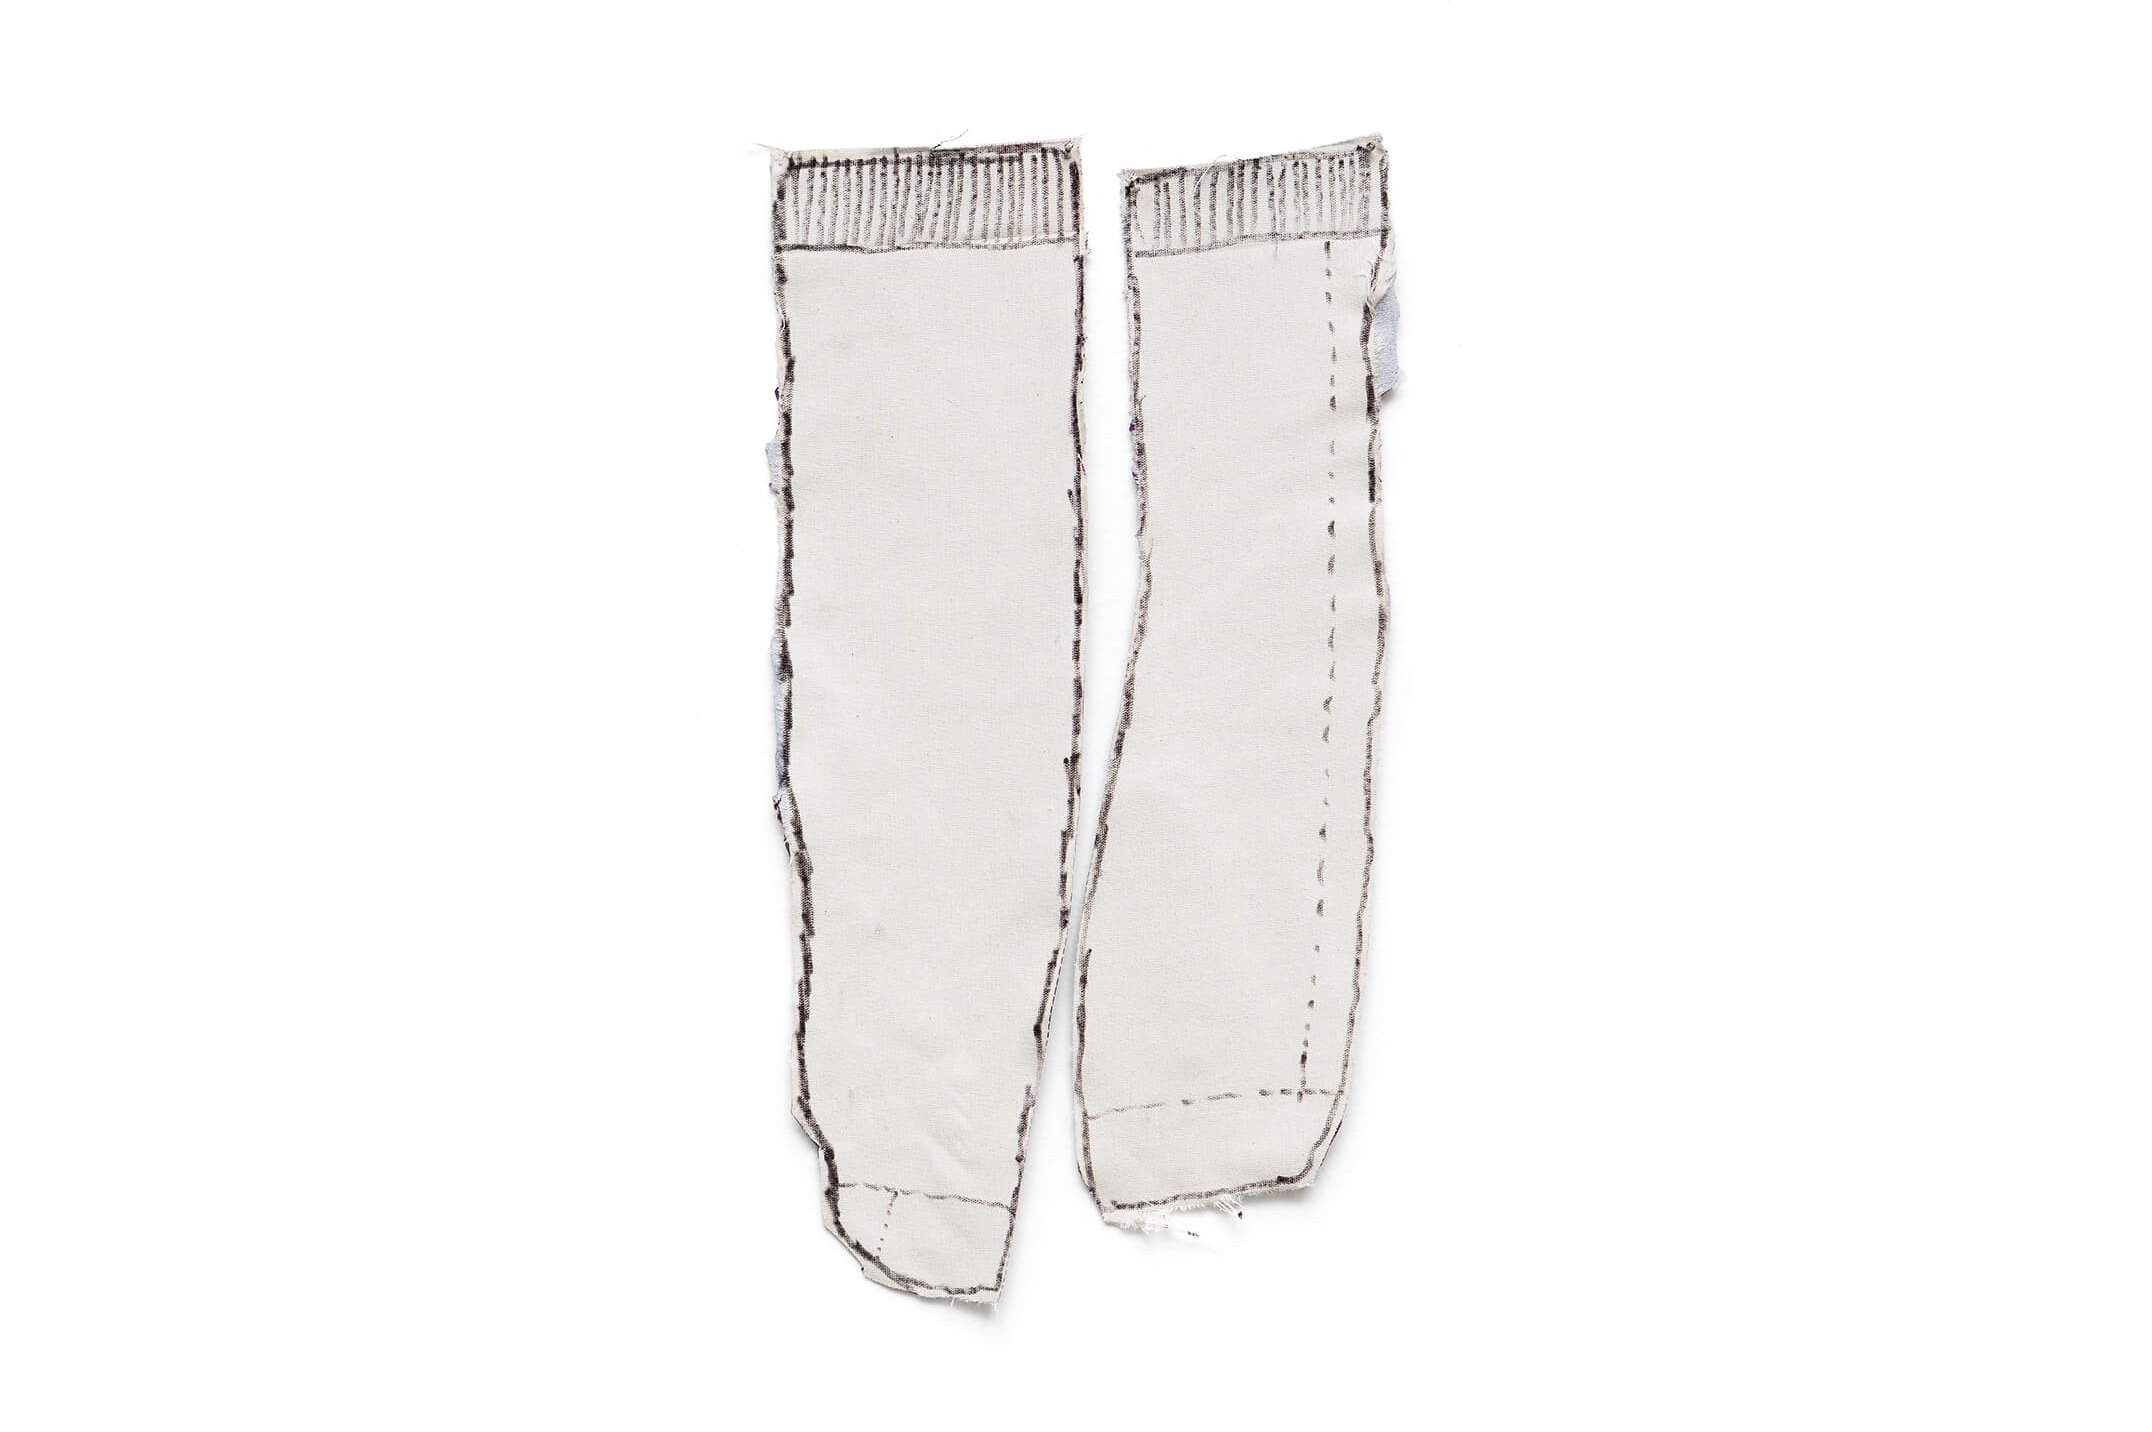 Adriano Costa,<em>A Pair of Socks</em>, 2015, pen on canvas, 38 × 20,5 cm - Mendes Wood DM